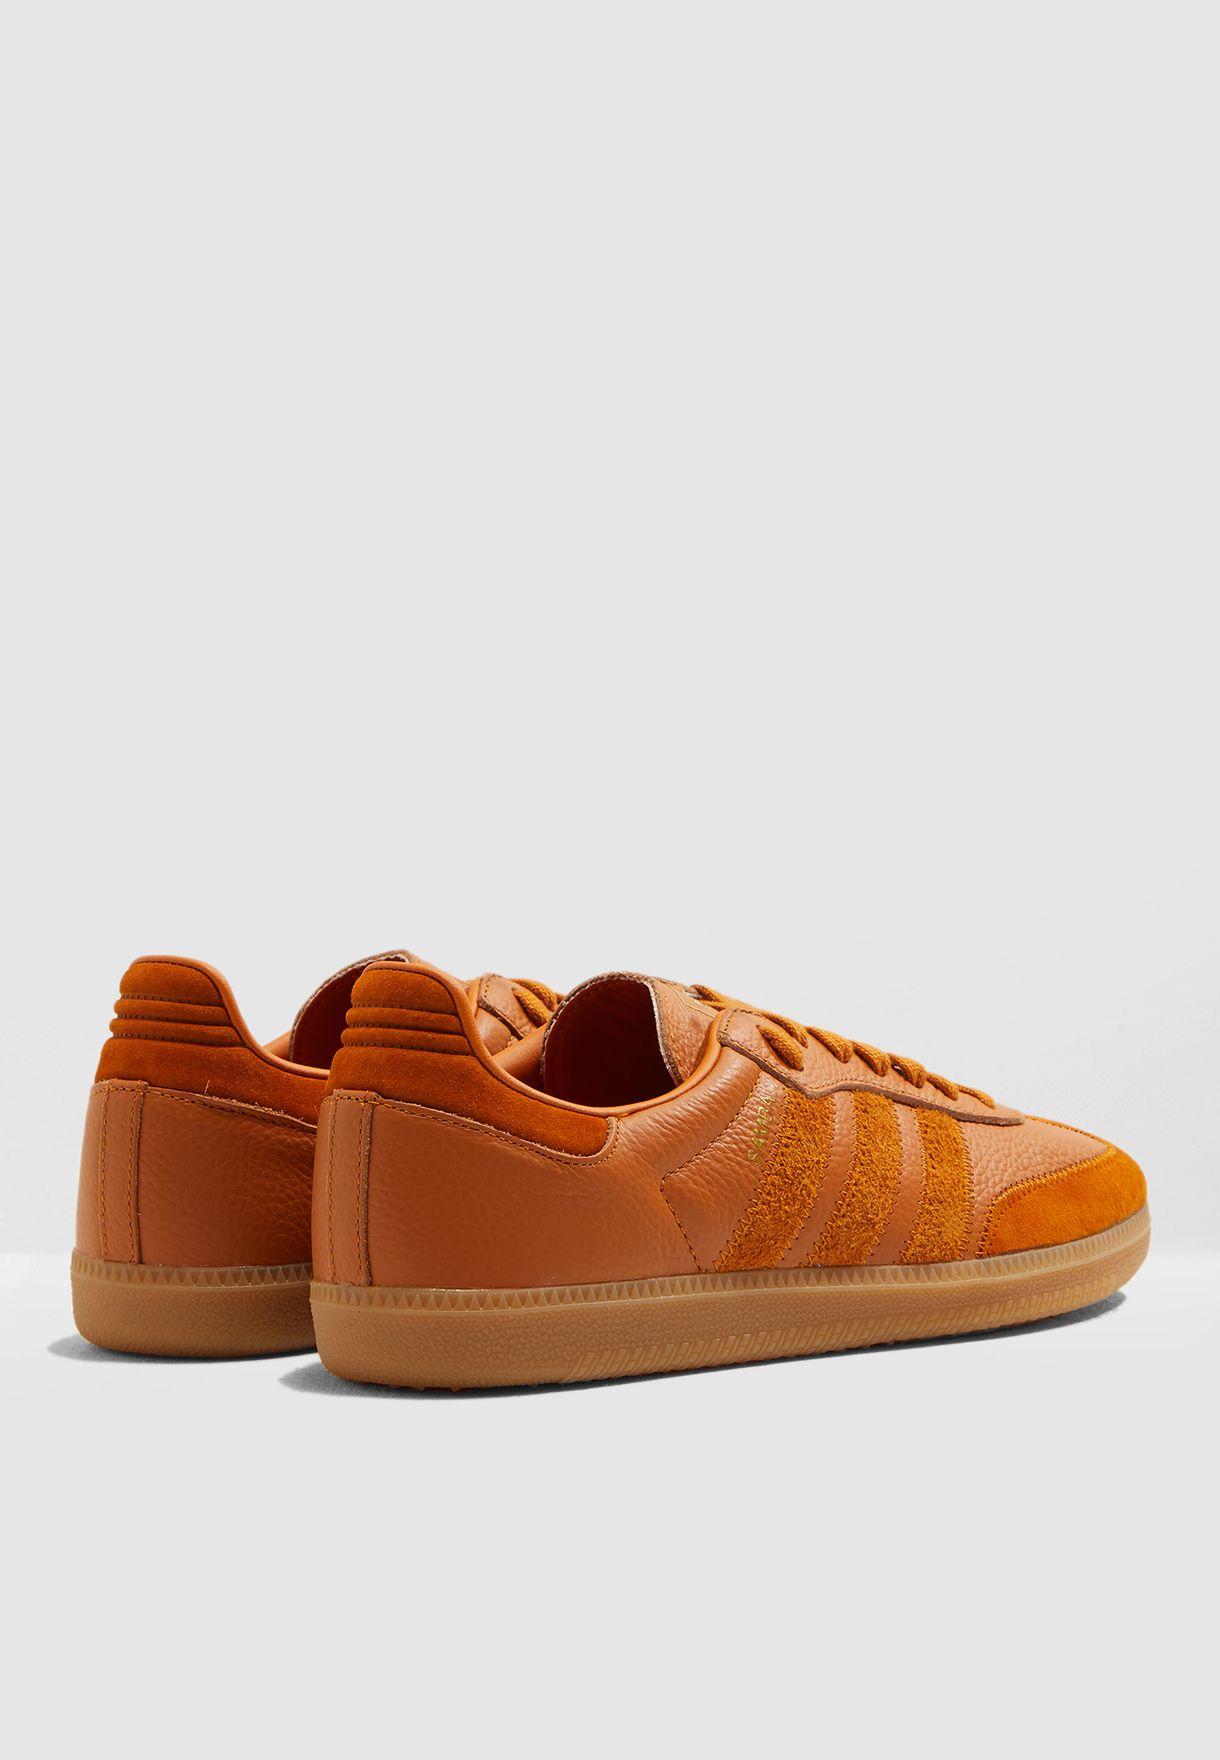 J.Crew men's Adidas® Samba® sneakers. To pre order, call 800